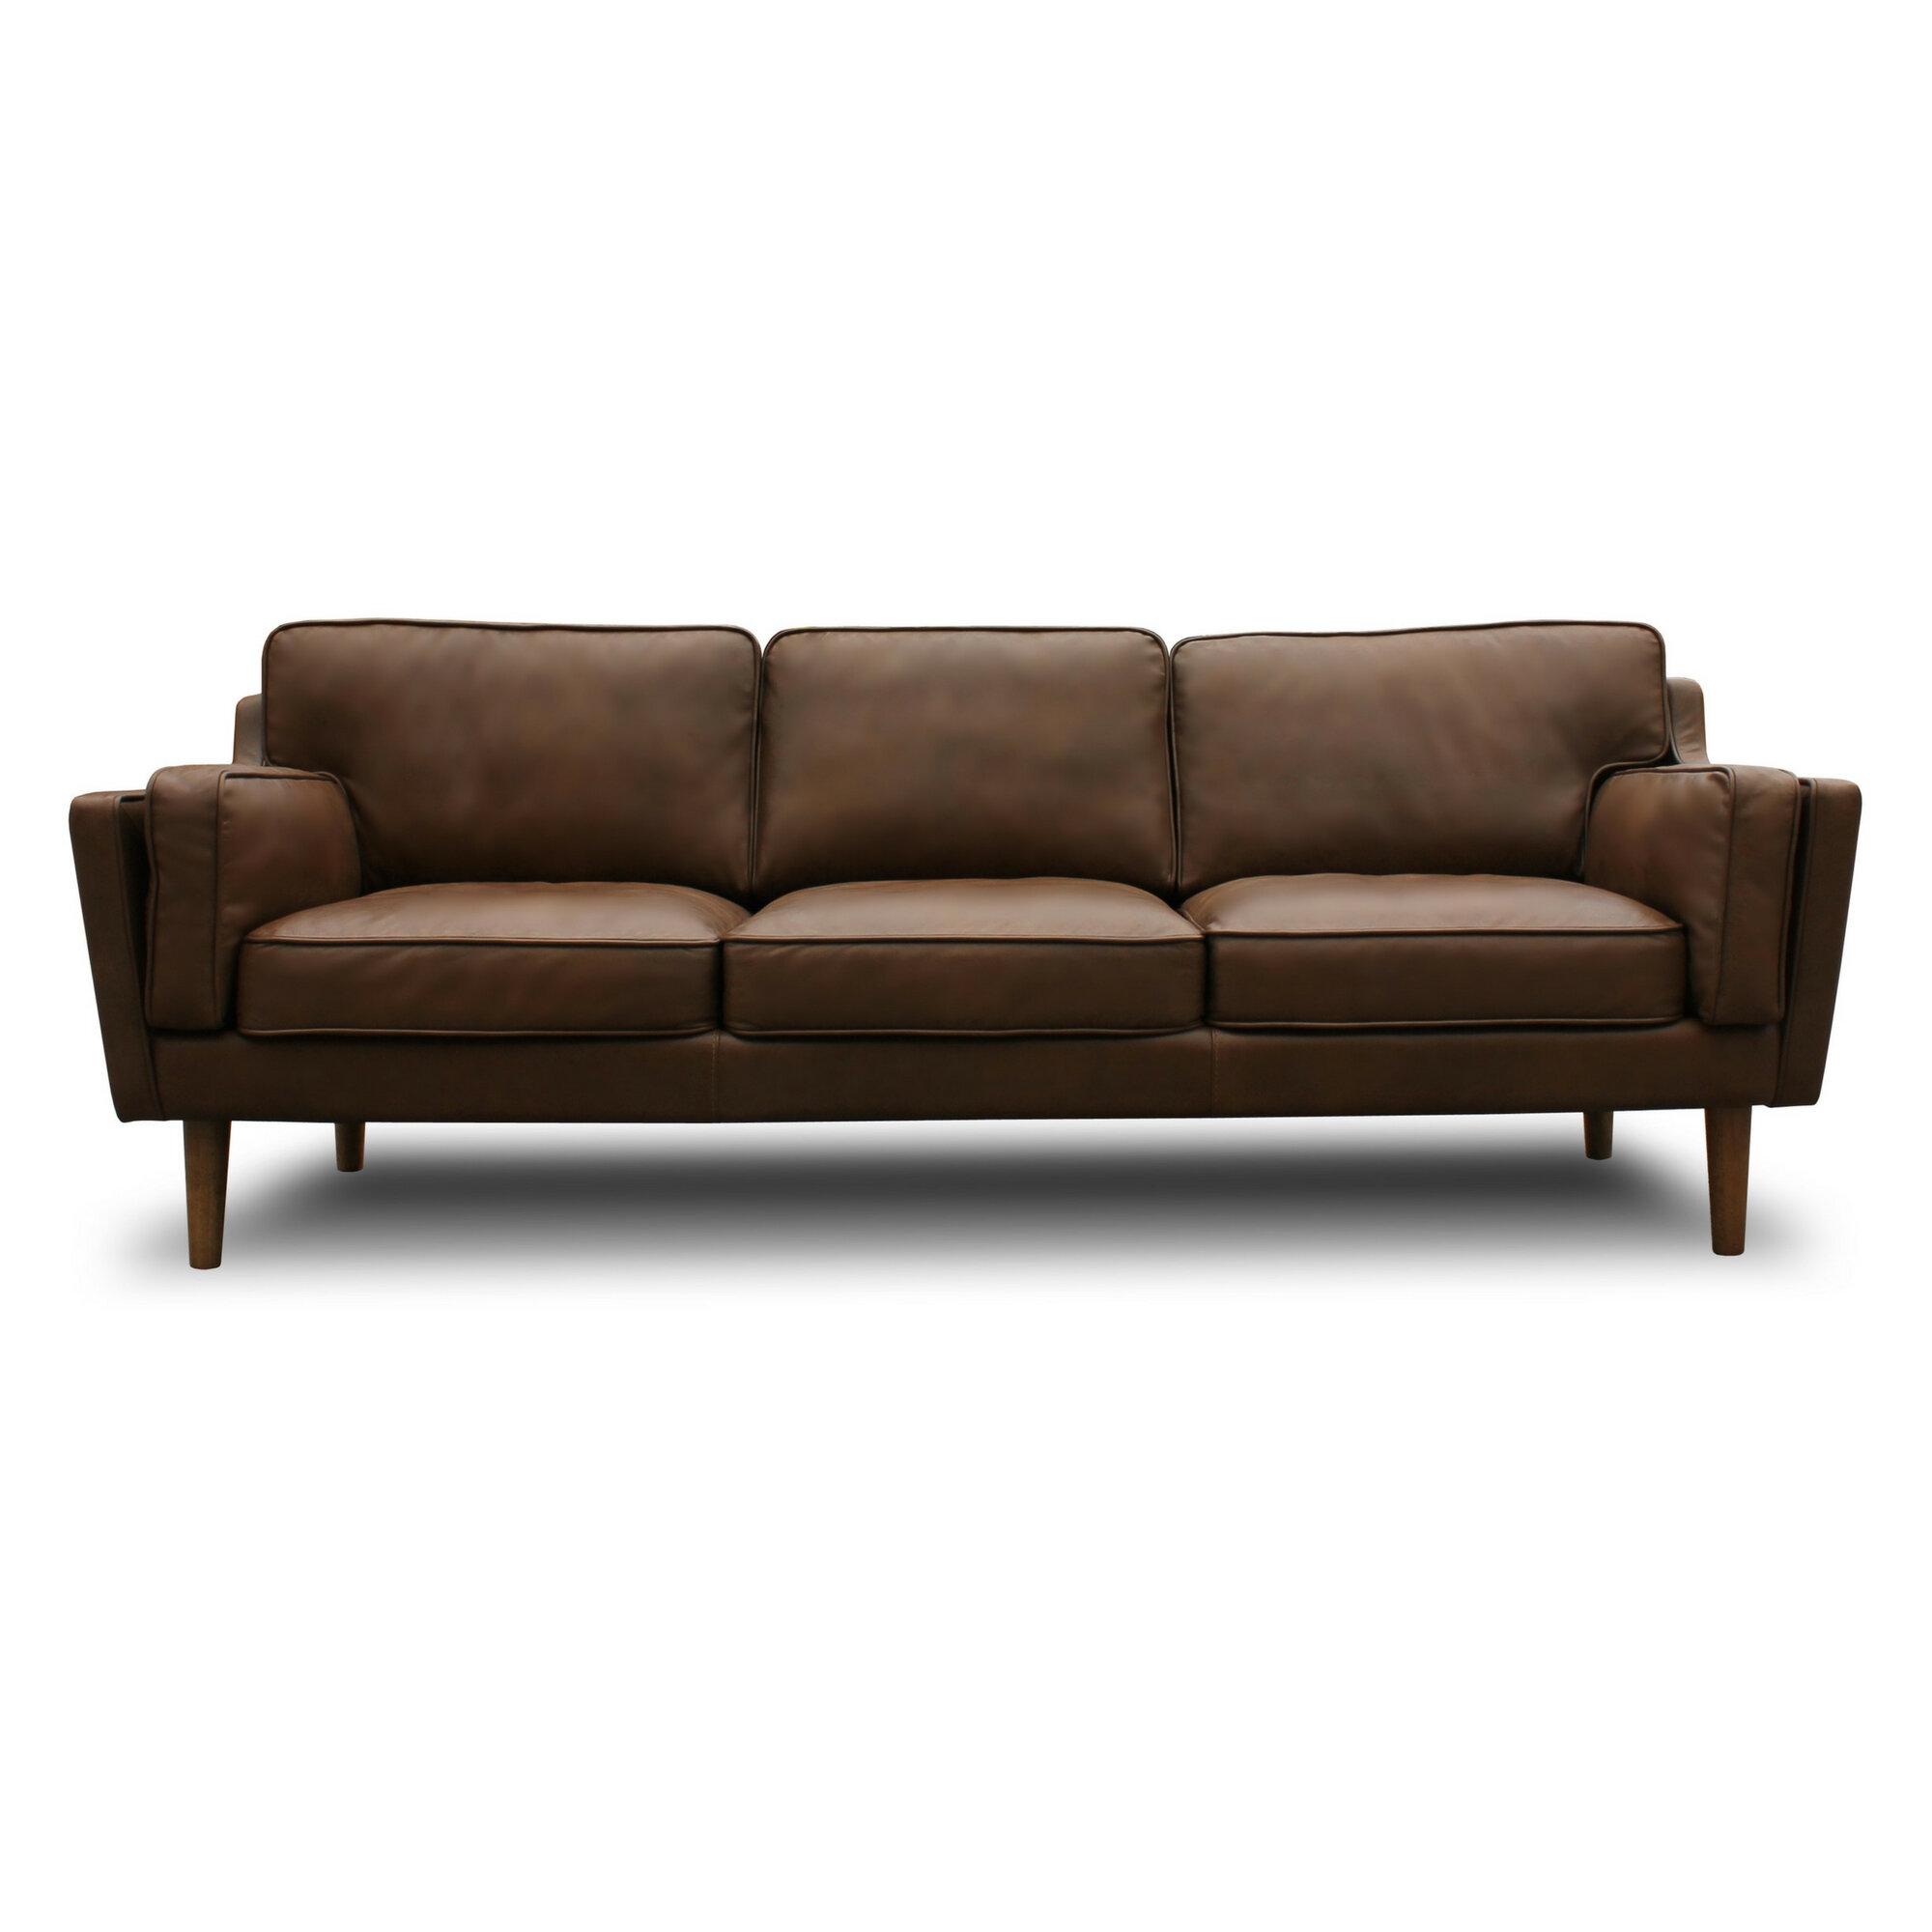 Modern Rustic Interiors Warren Mid Century Modern Leather Sofa